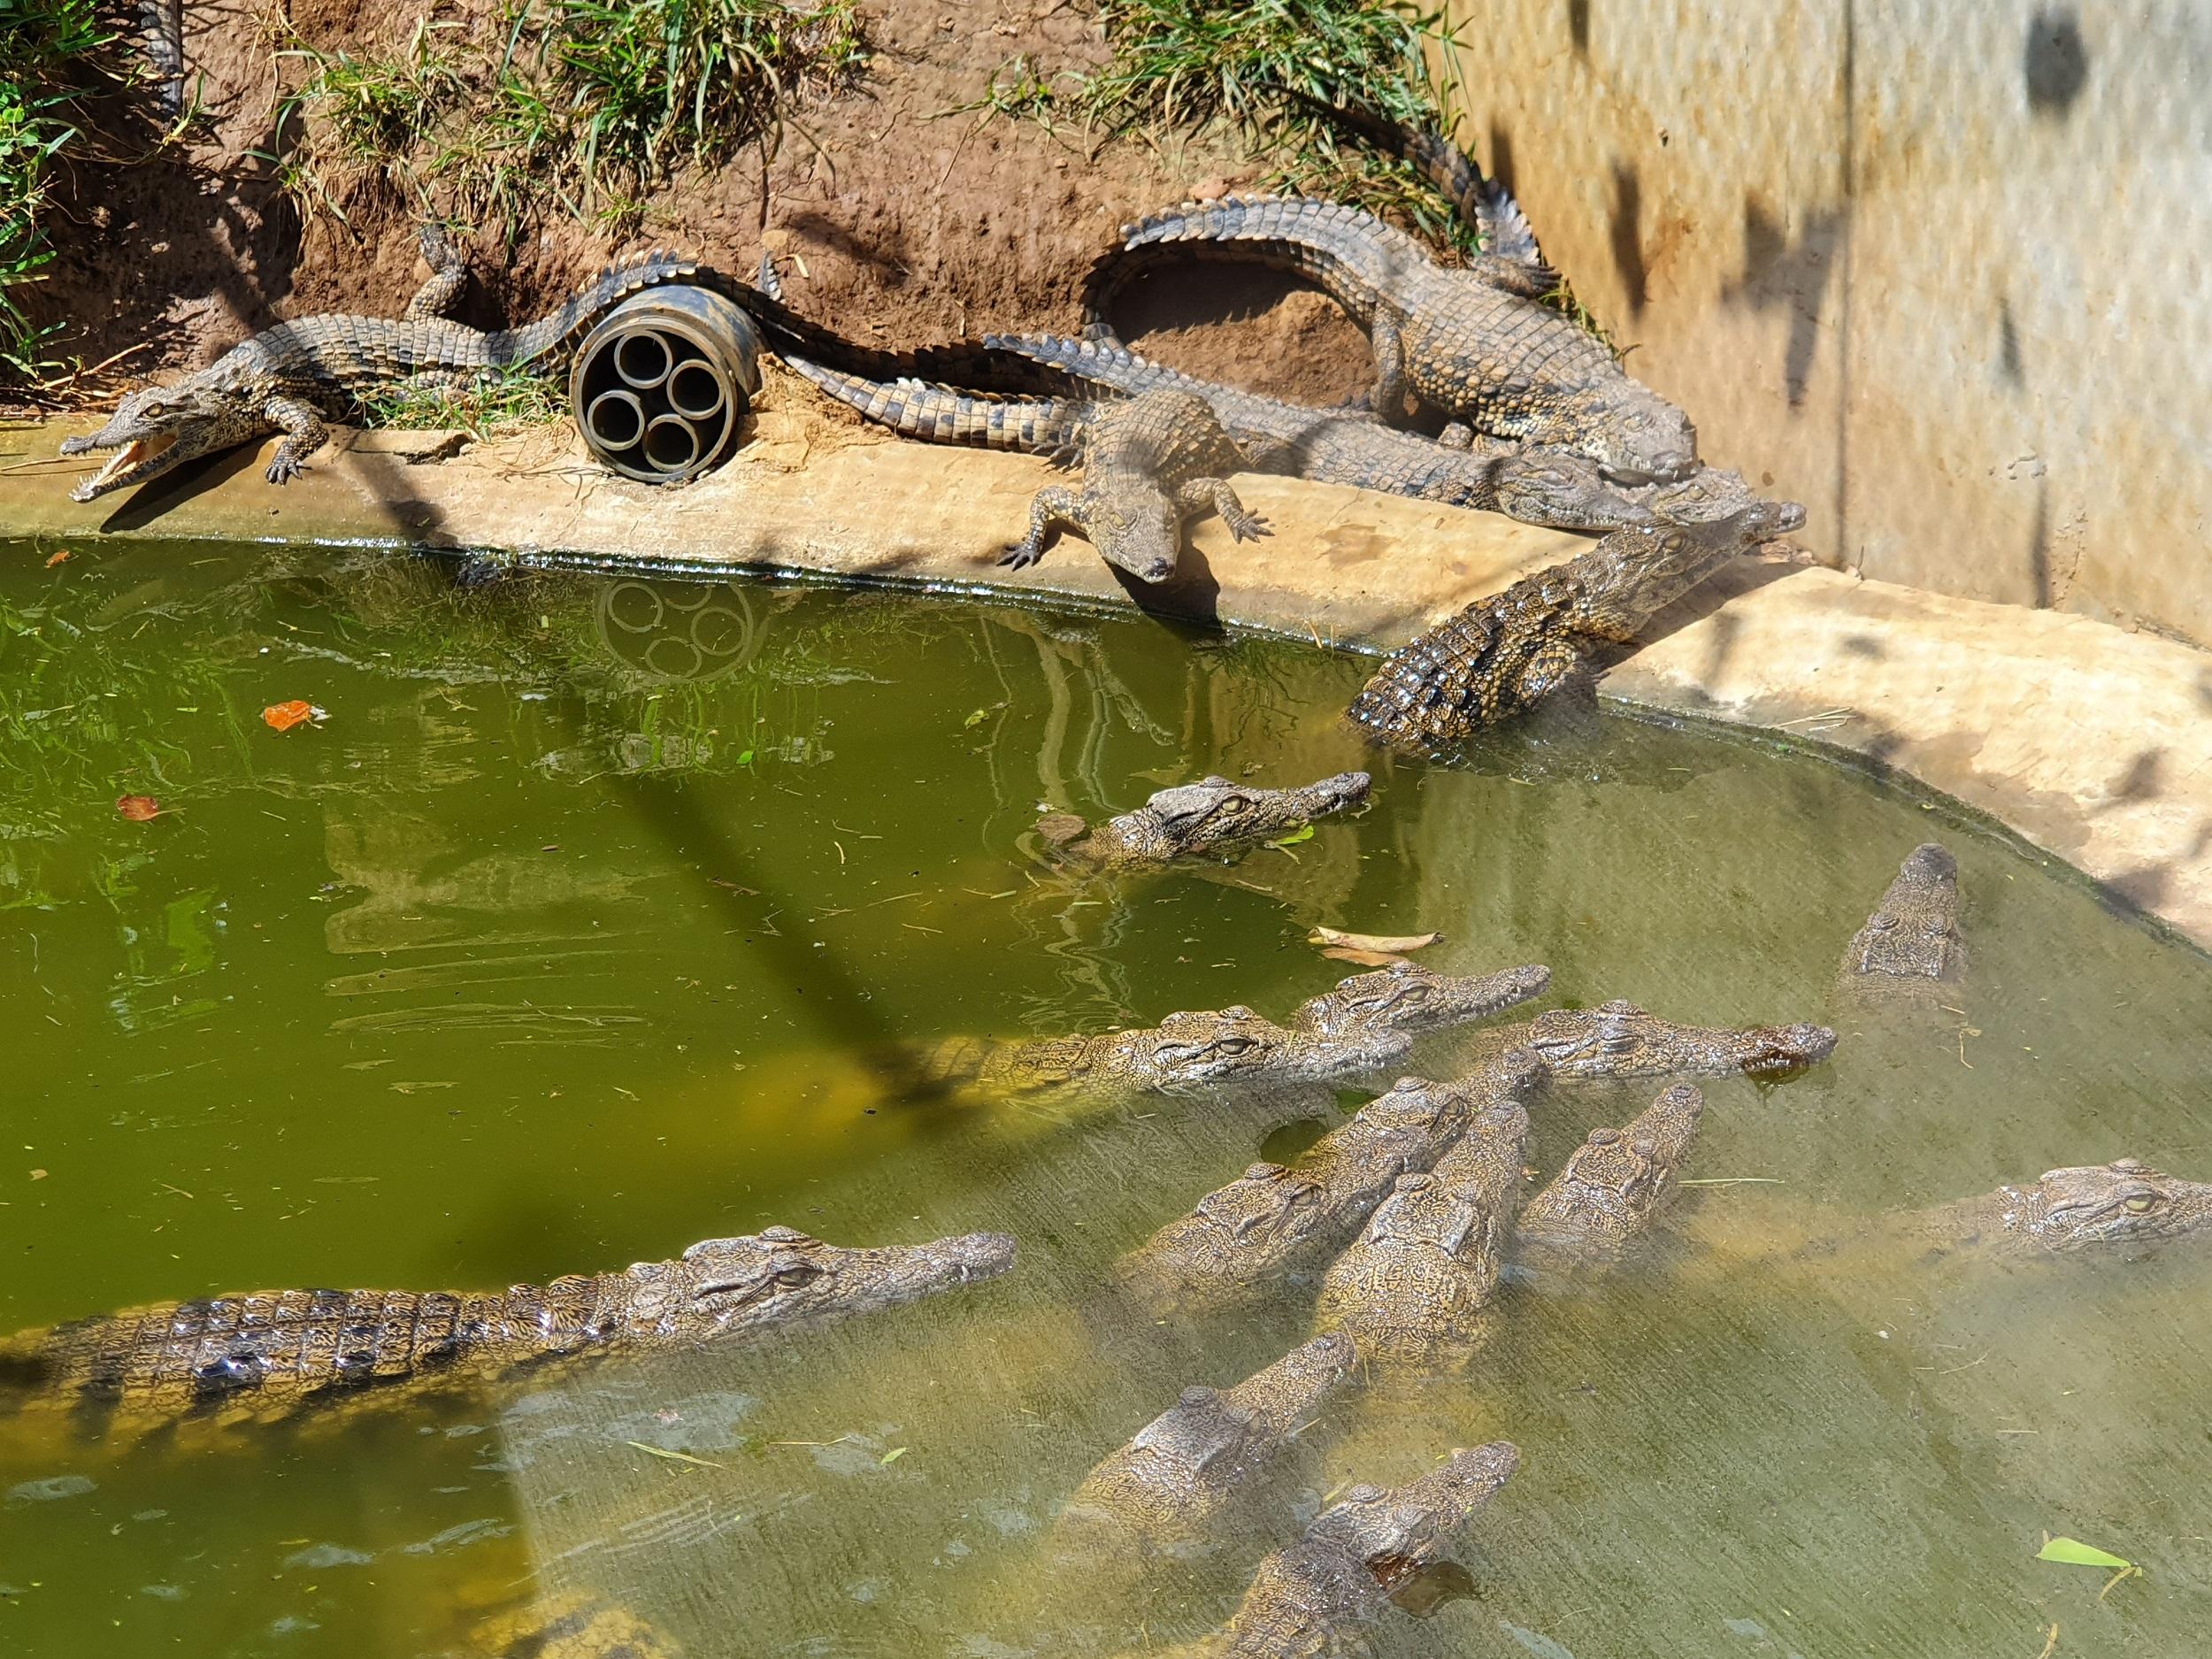 Ferma de crocodili